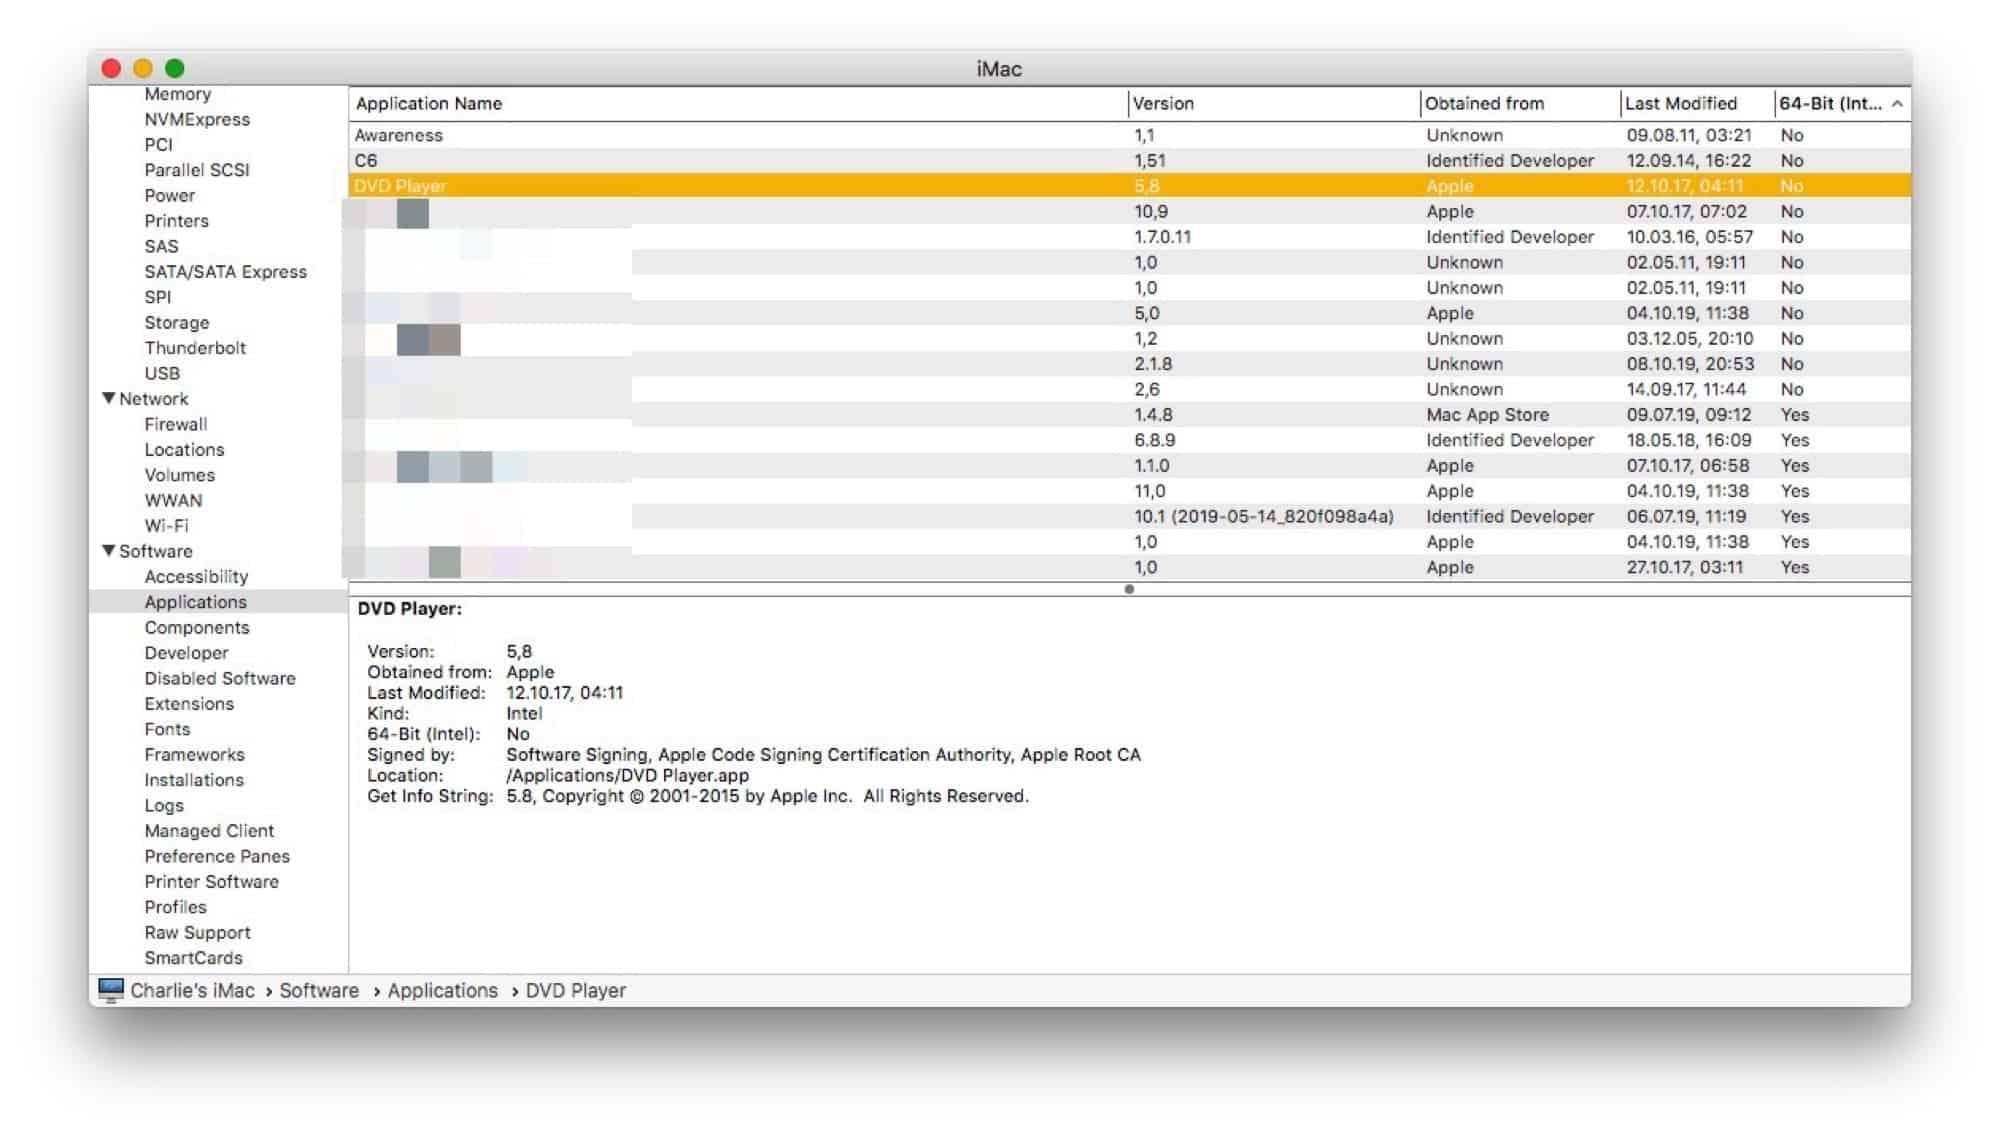 Kiểm tra app là 32 bit hay 64 bit trên macOS